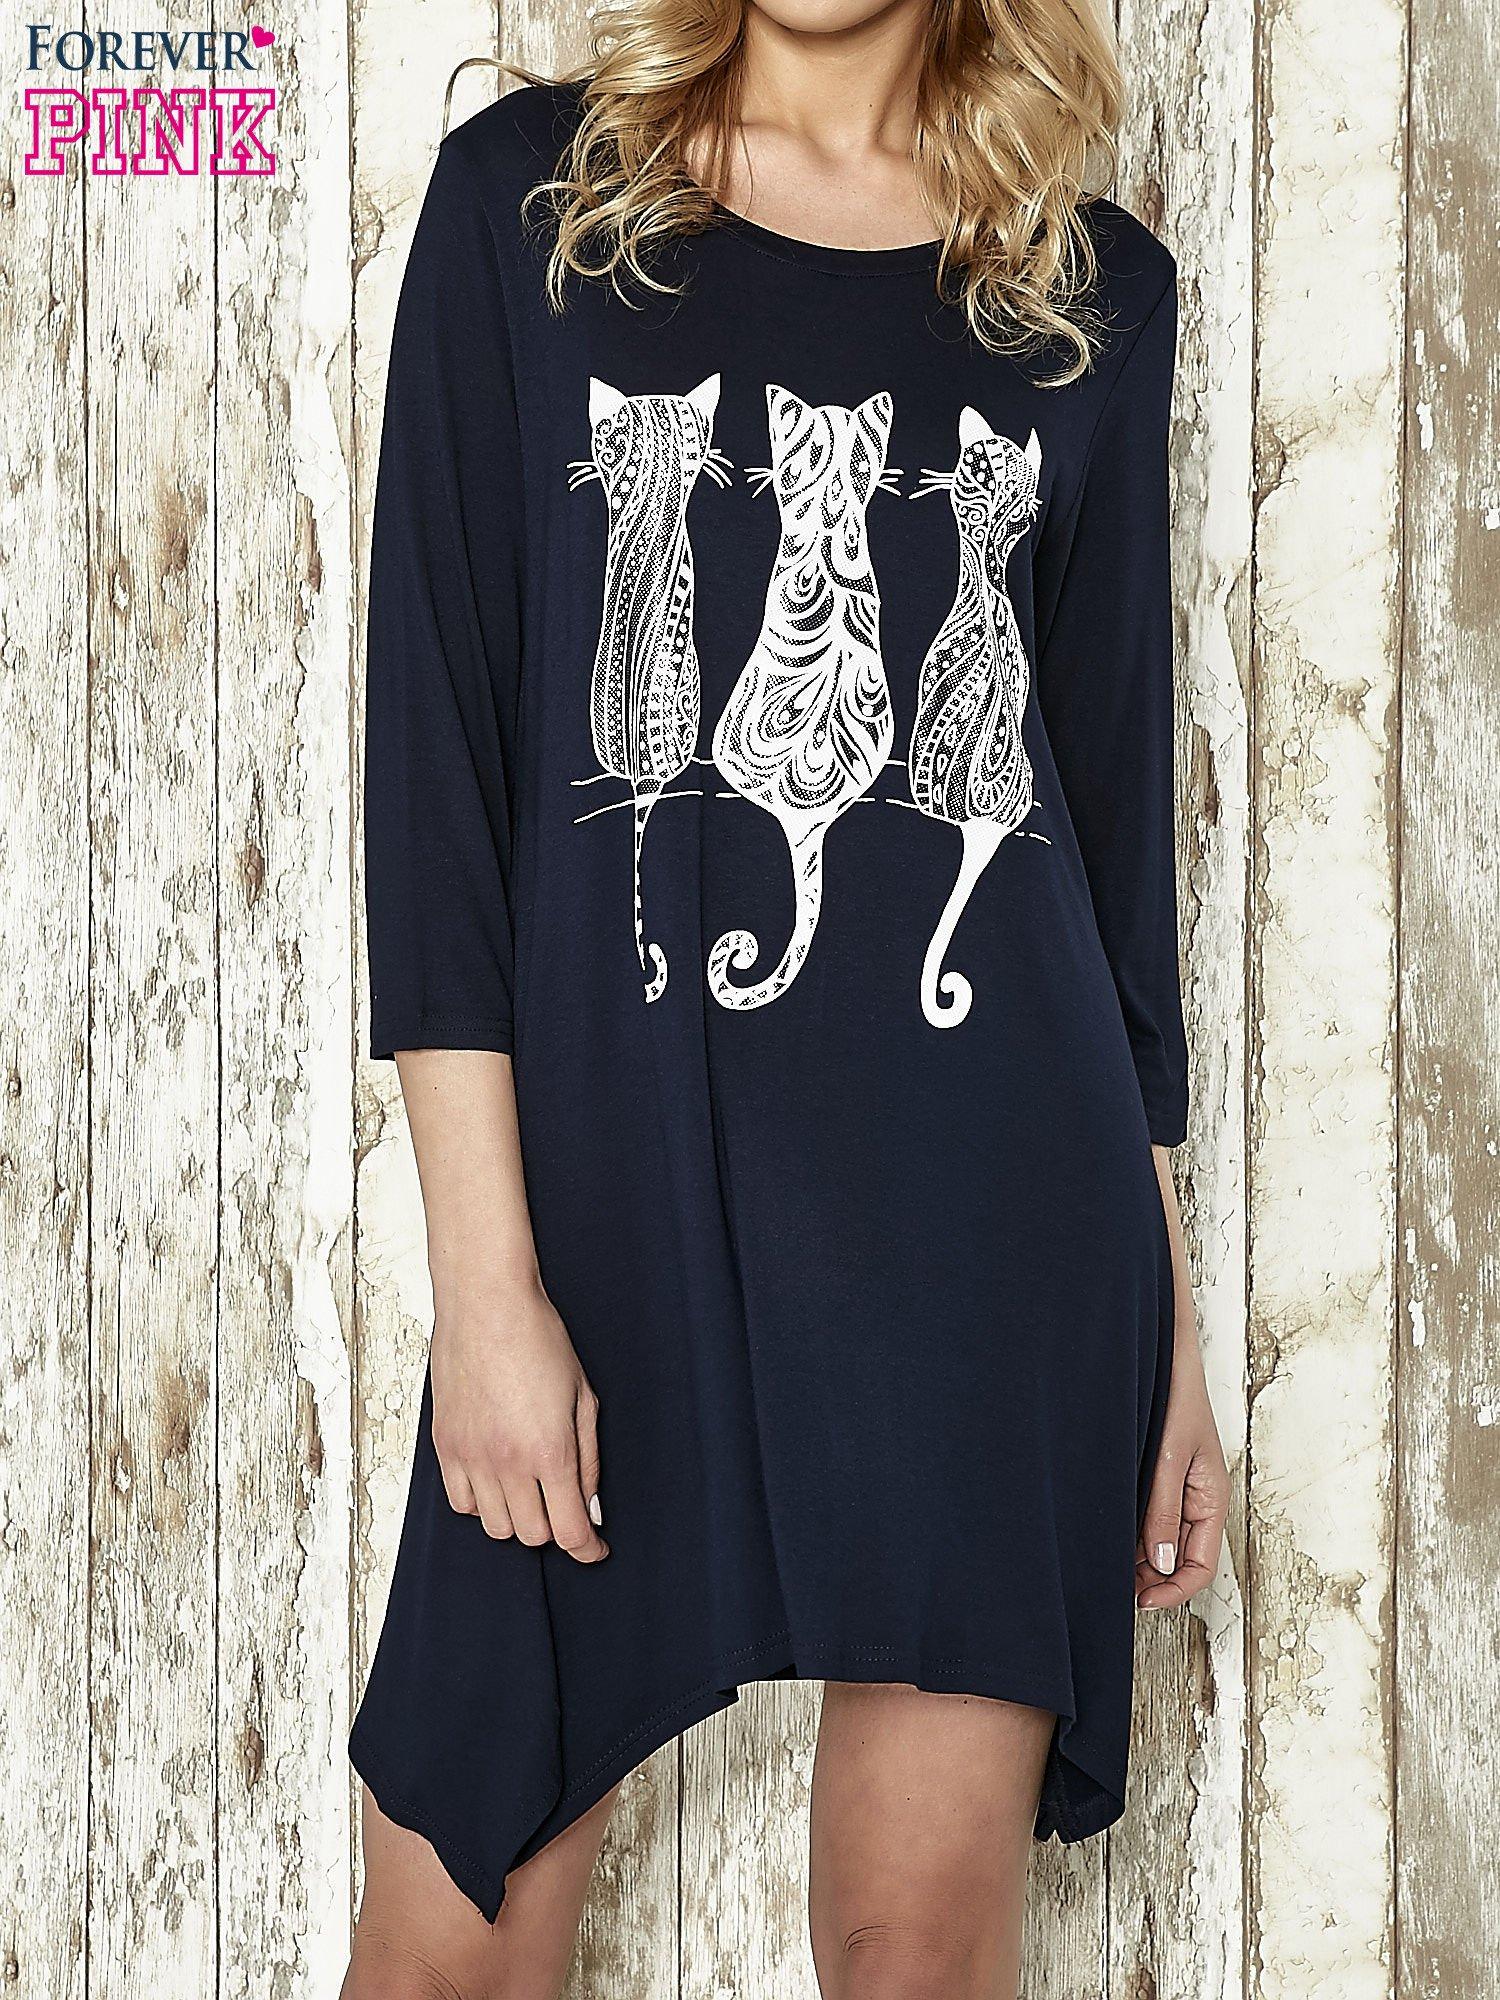 Granatowa sukienka damska z nadrukiem kotów                                  zdj.                                  1